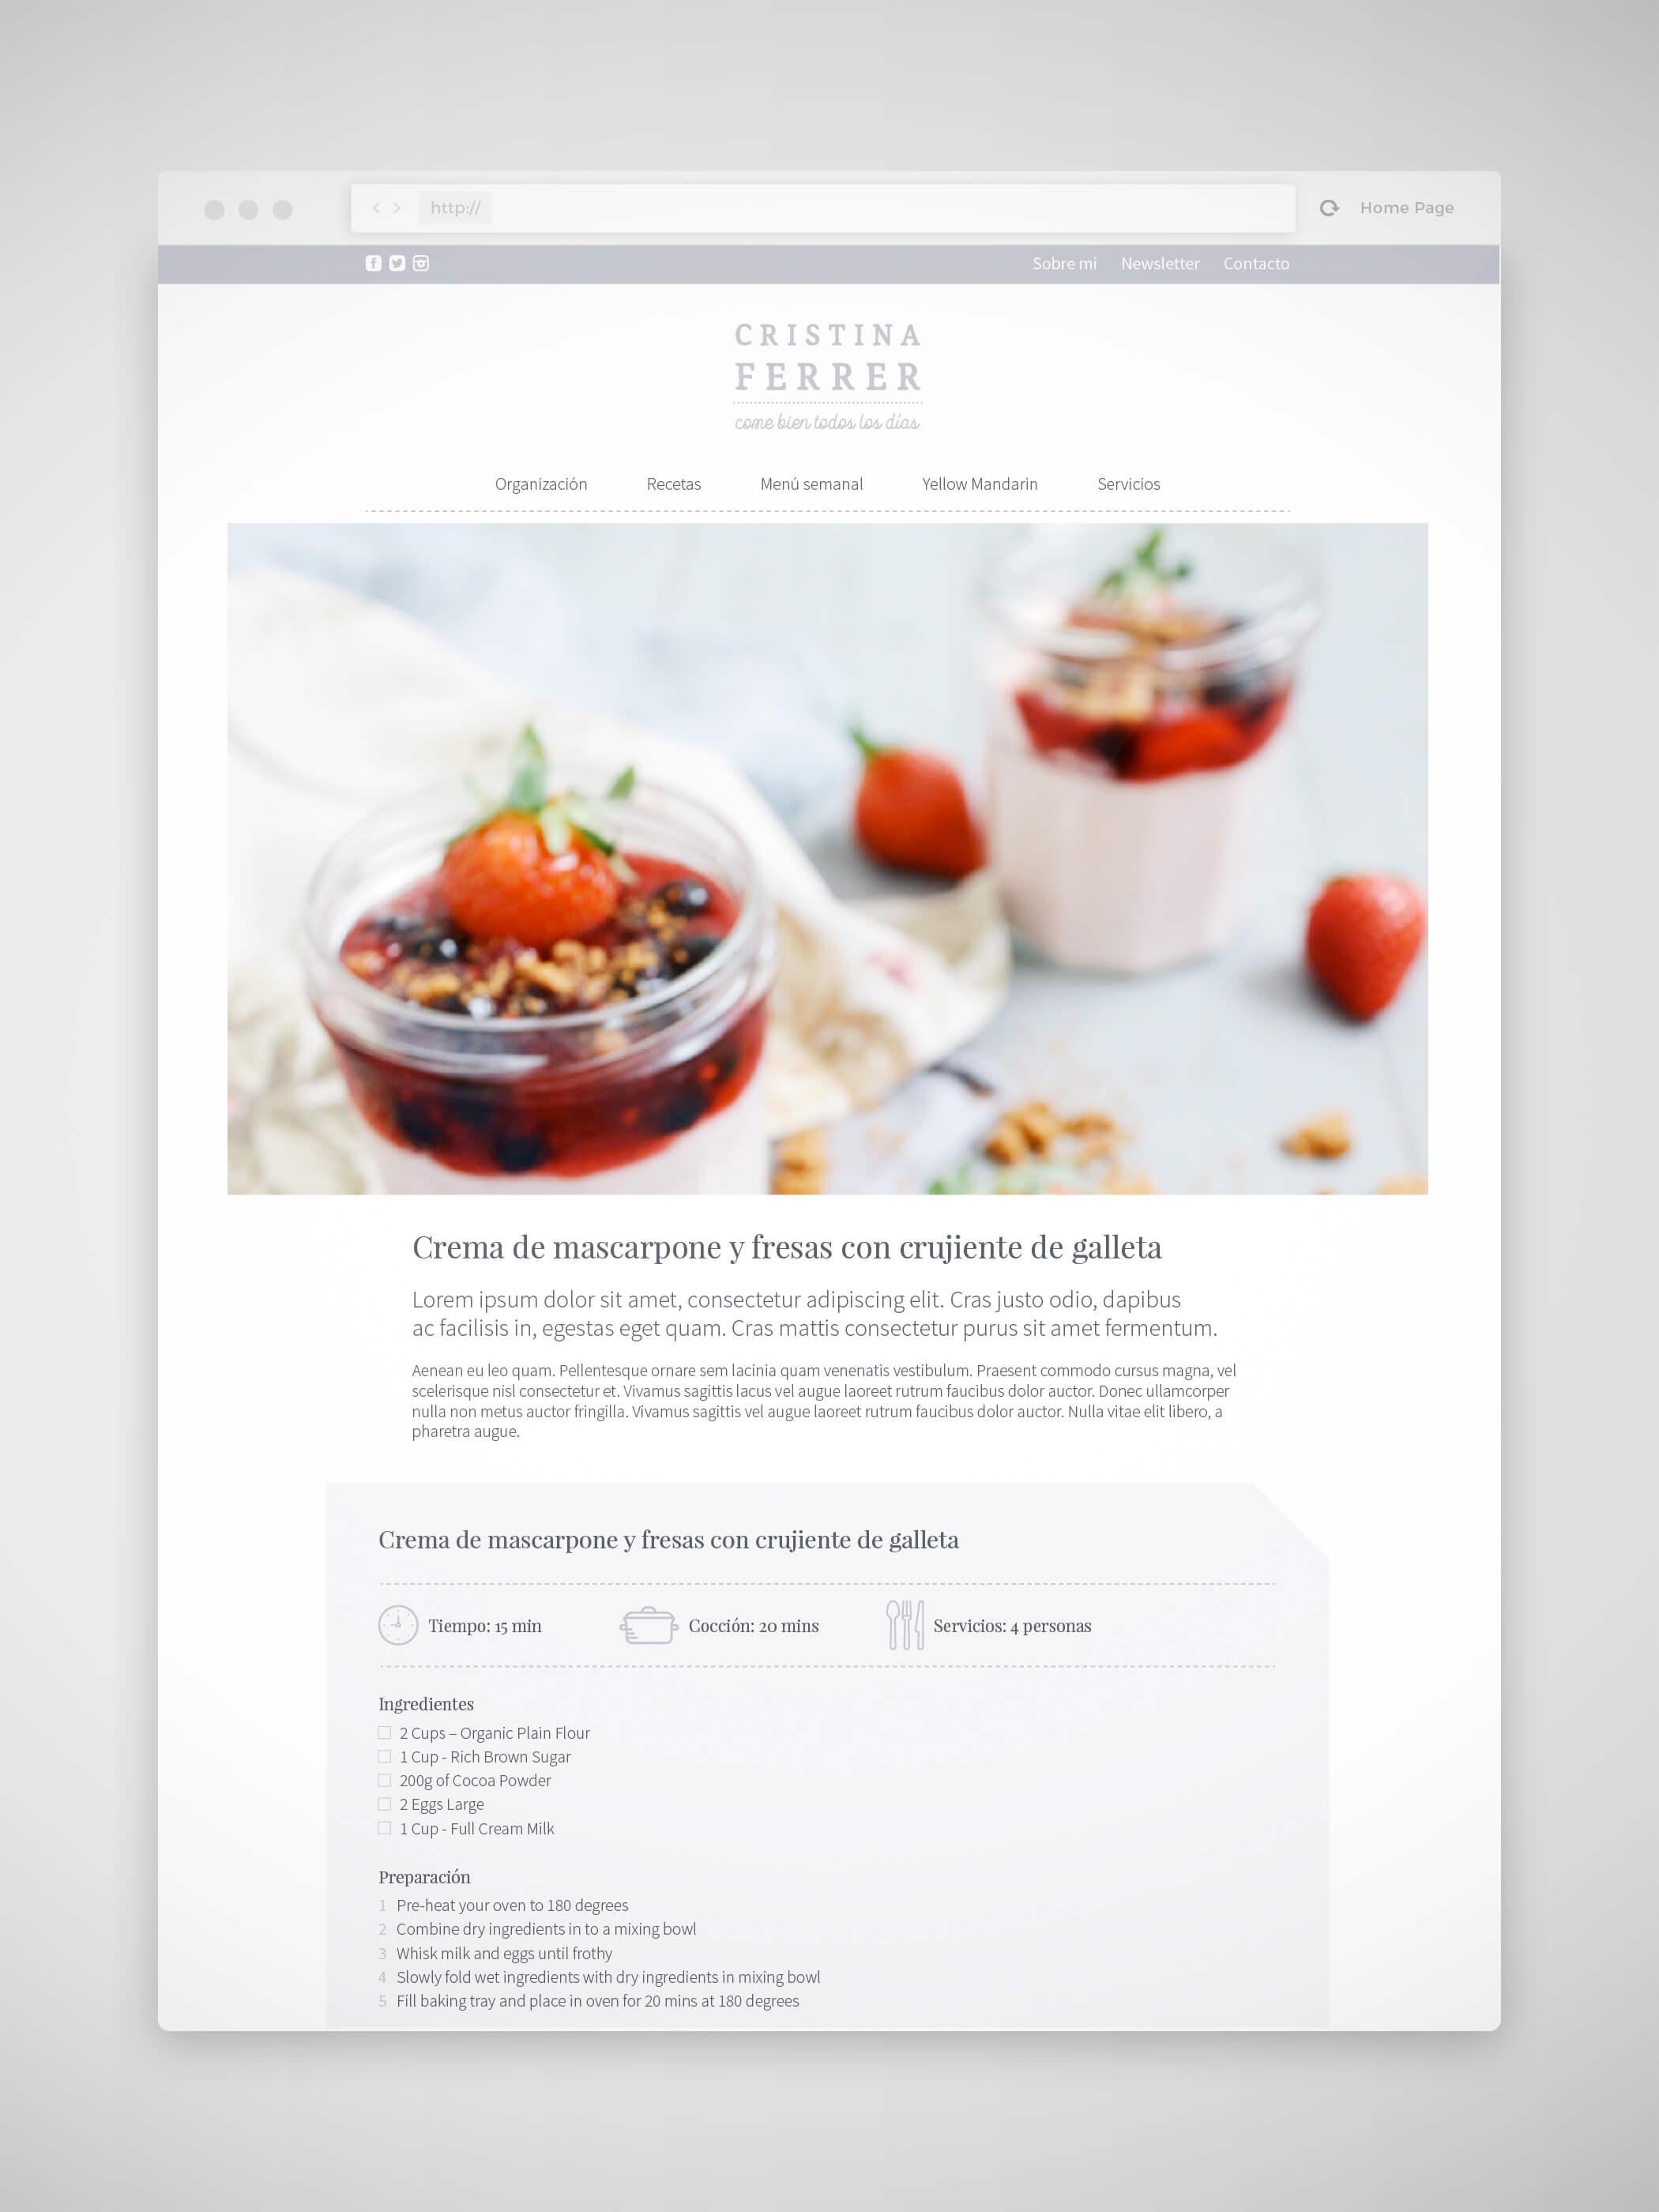 Diseño web Cristina Ferrer